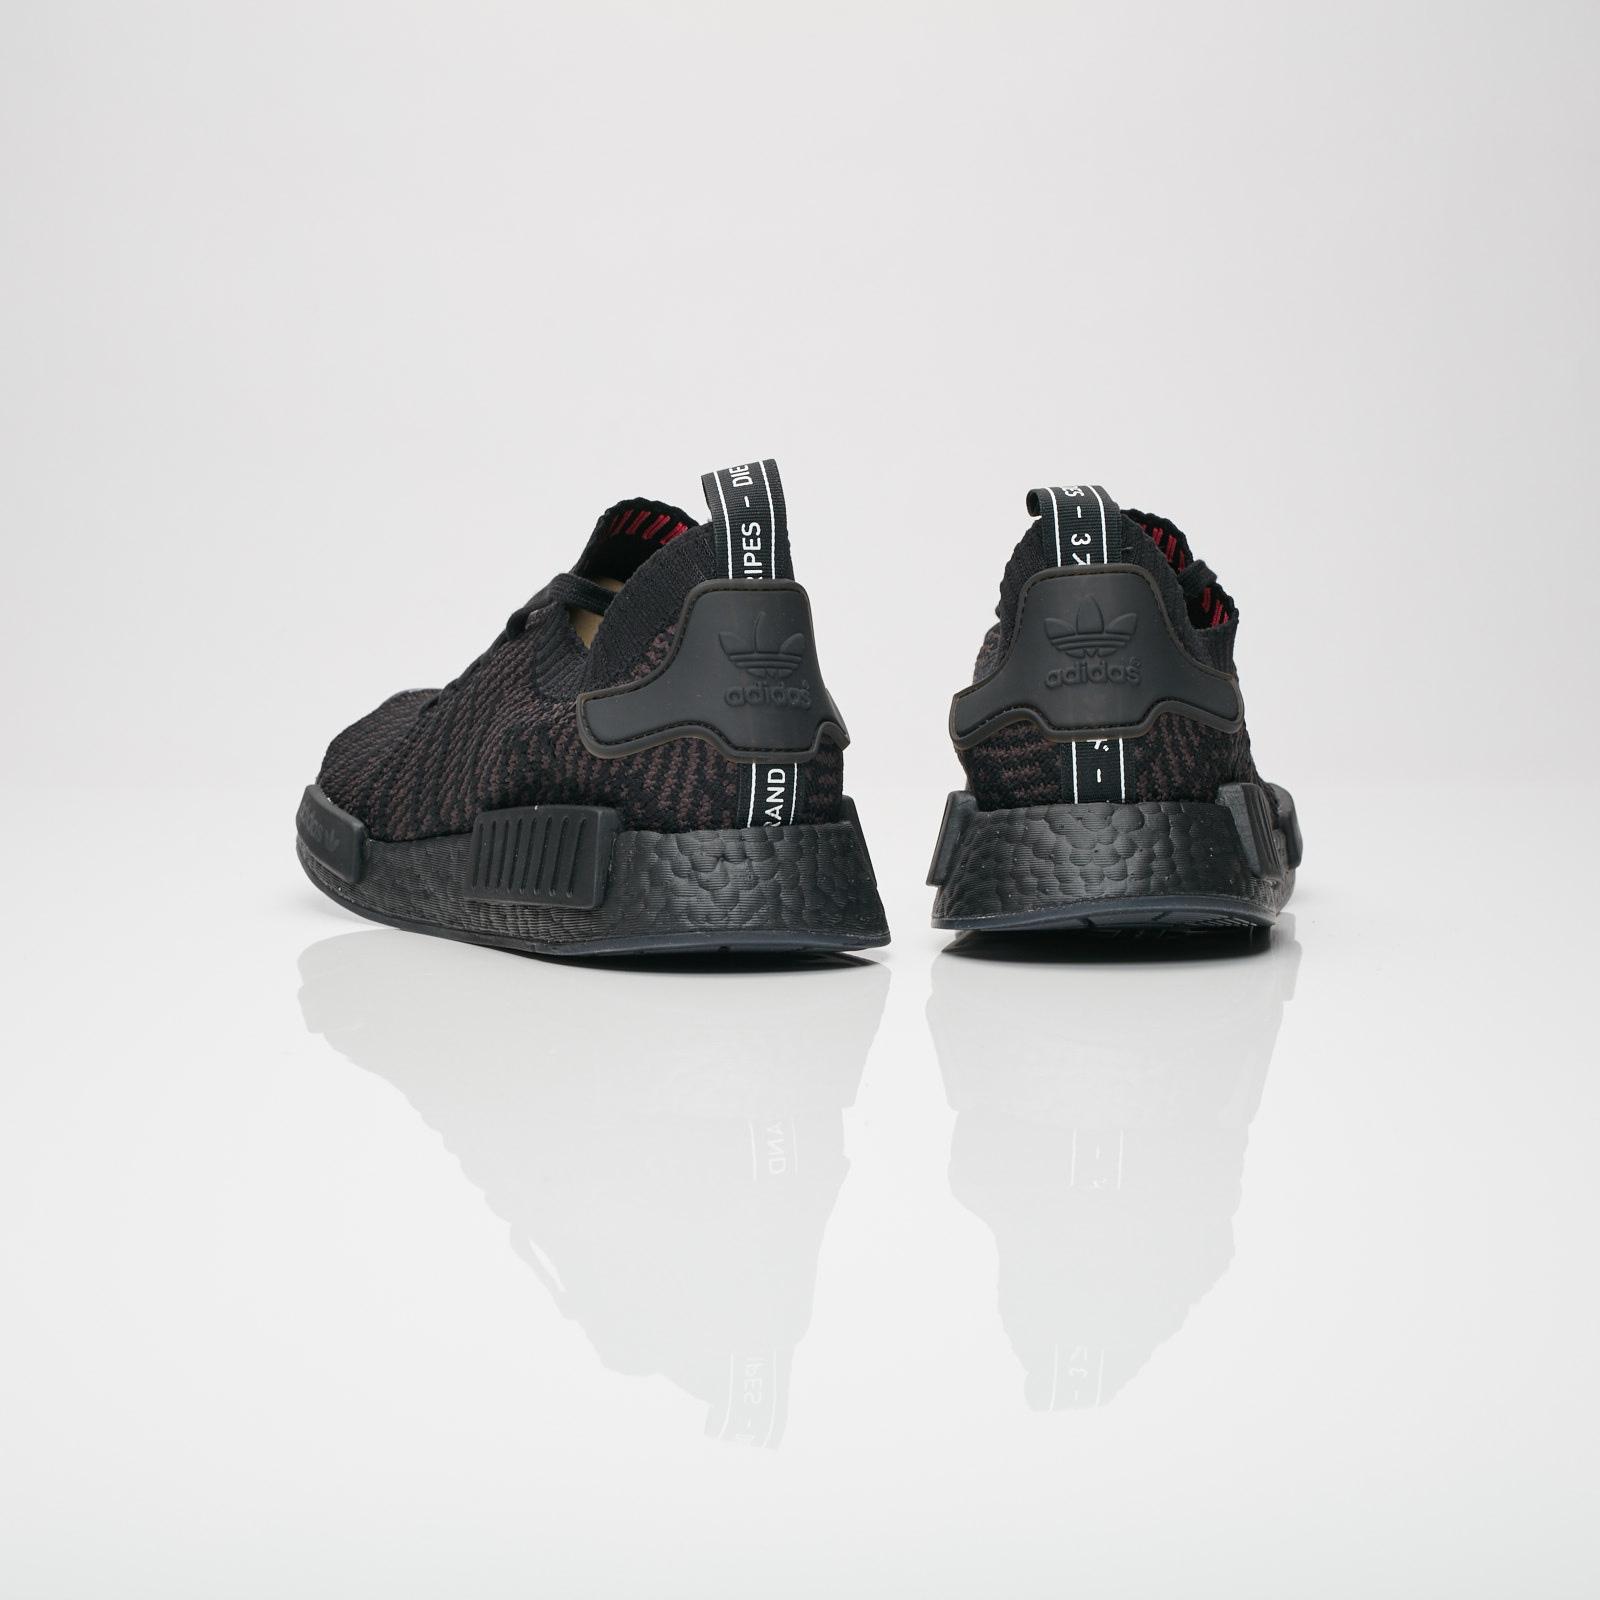 7c42e78f5a999 adidas NMD R1 Stlt PK - Cq2391 - Sneakersnstuff